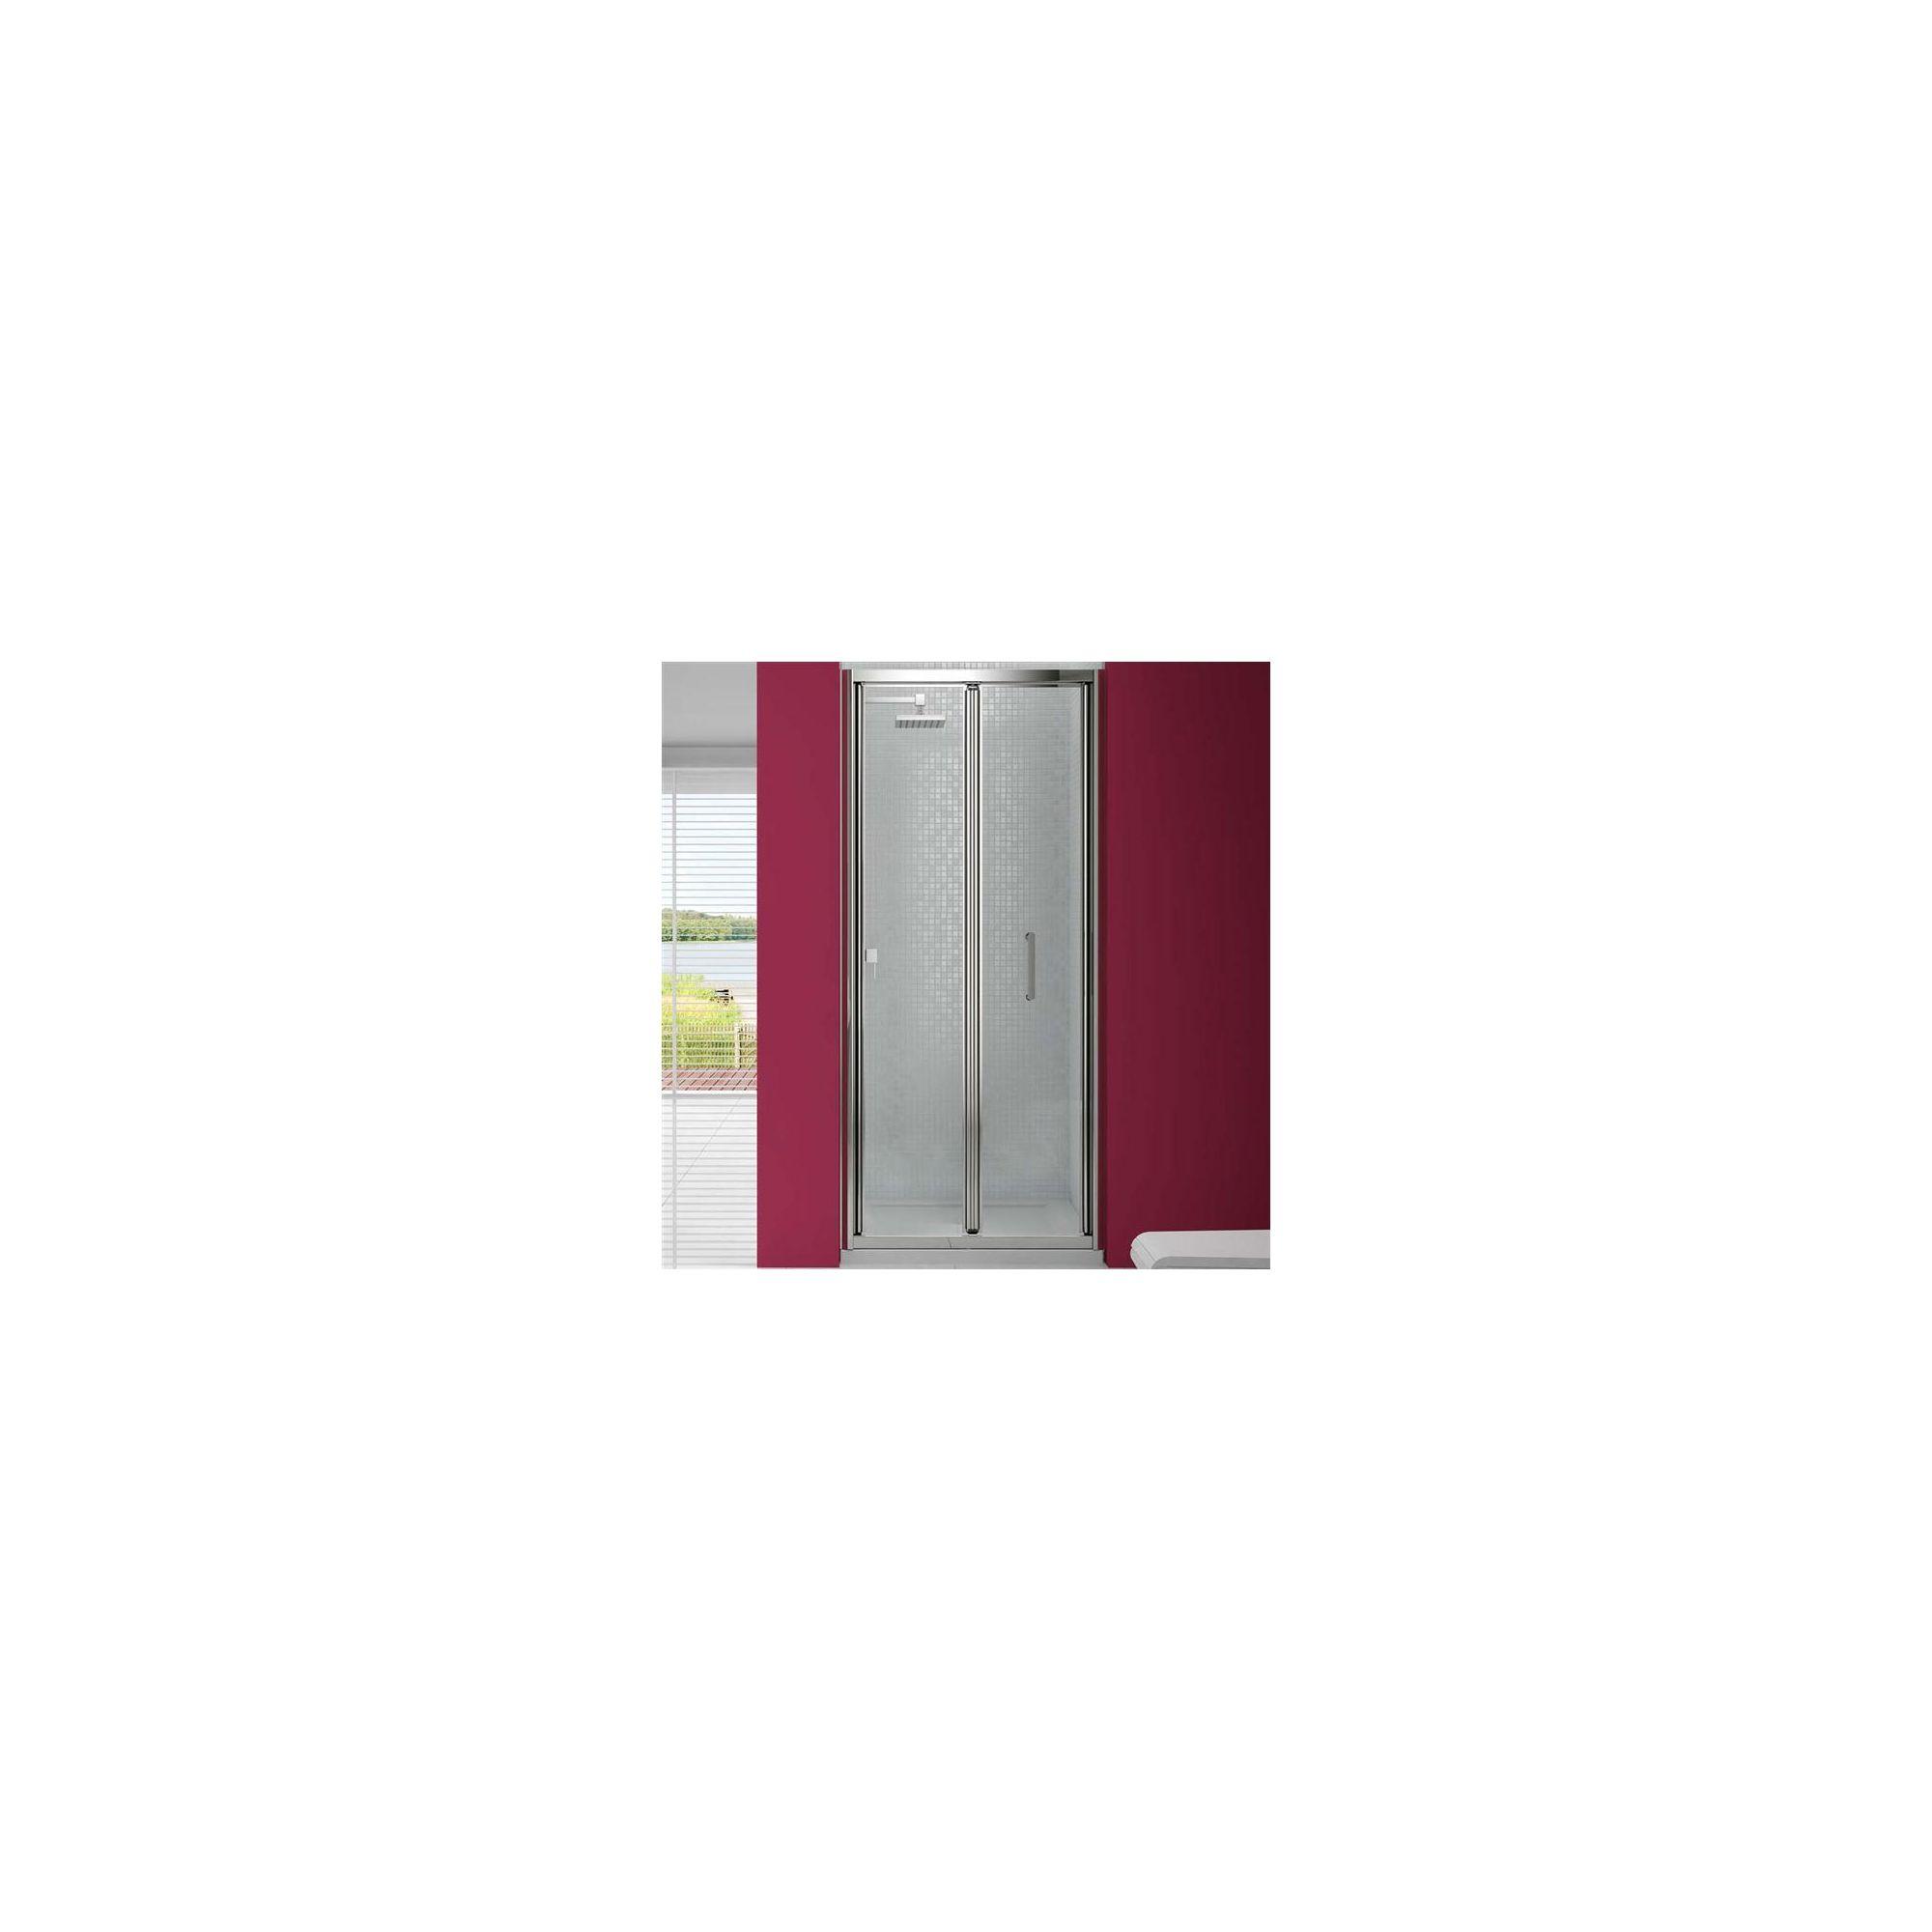 Merlyn Vivid Six Bi-Fold Shower Door, 760/800mm x 760/800mm, 6mm Glass at Tesco Direct